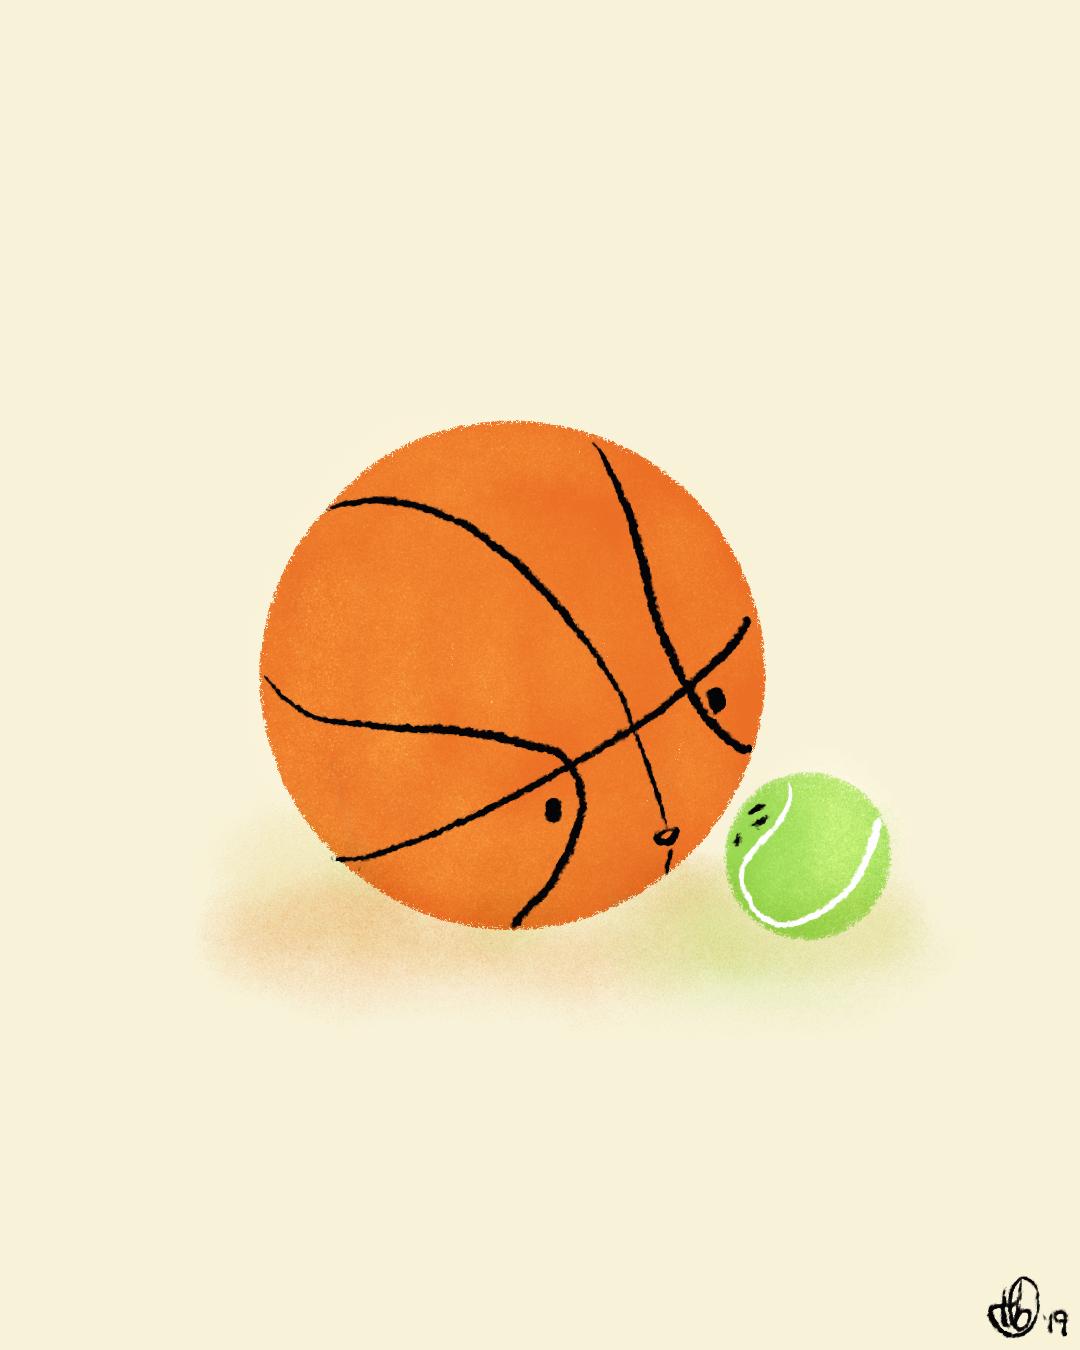 BonaddioTeresa_basketballtennis.PNG